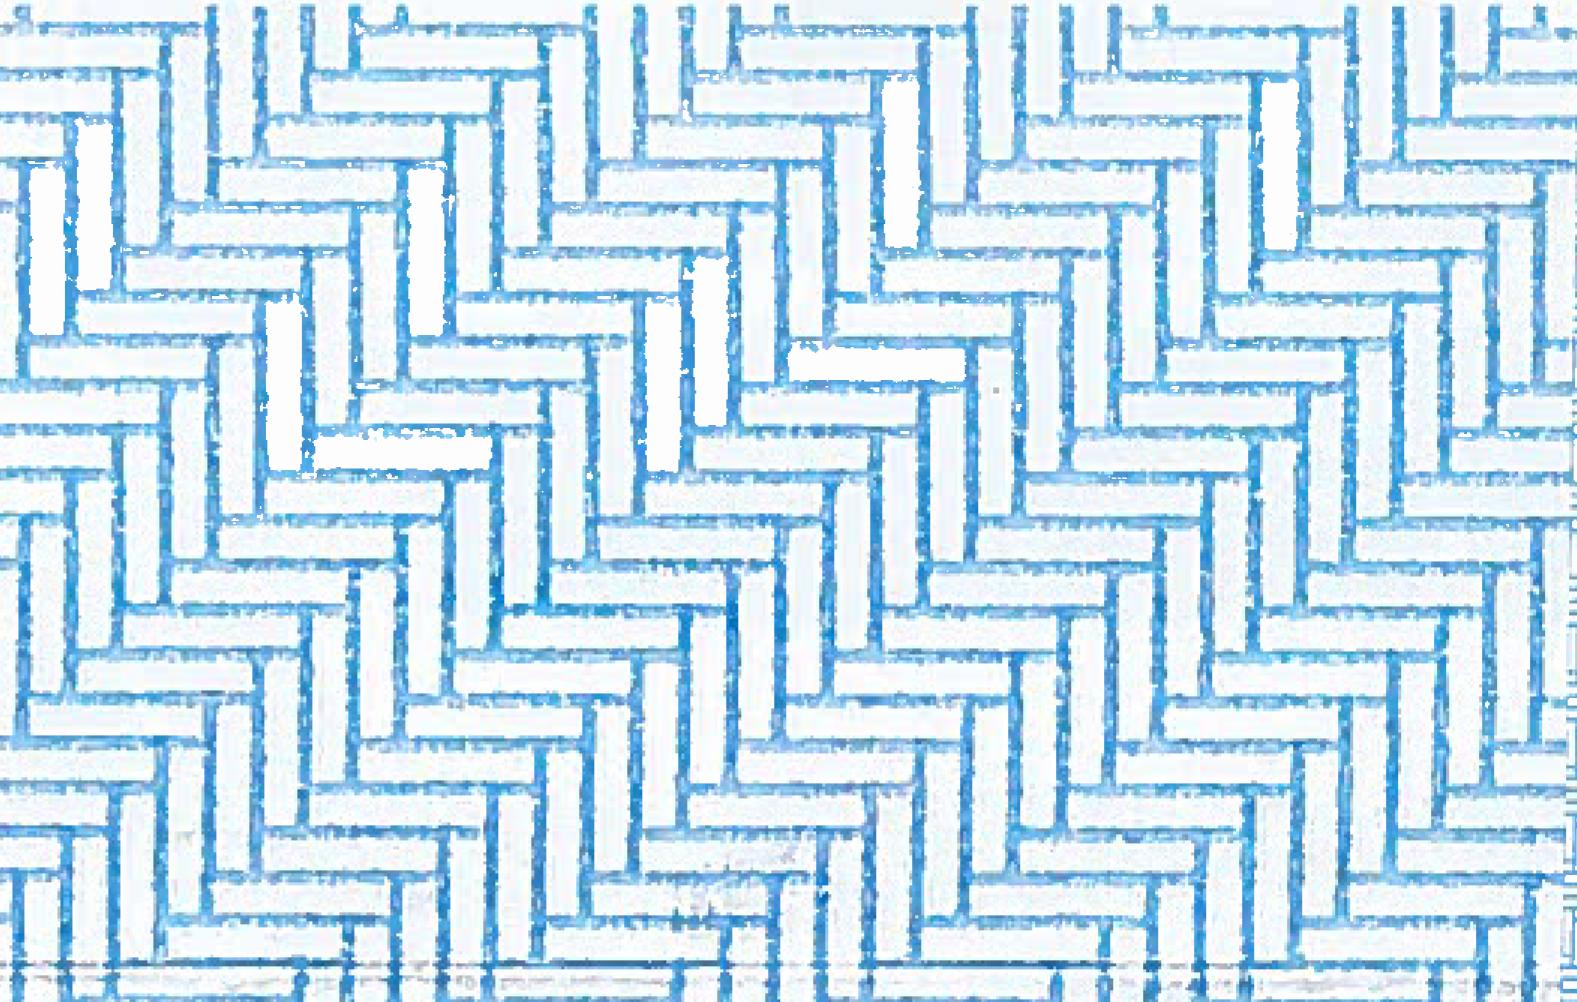 envelope security patterns blue and white herringbone